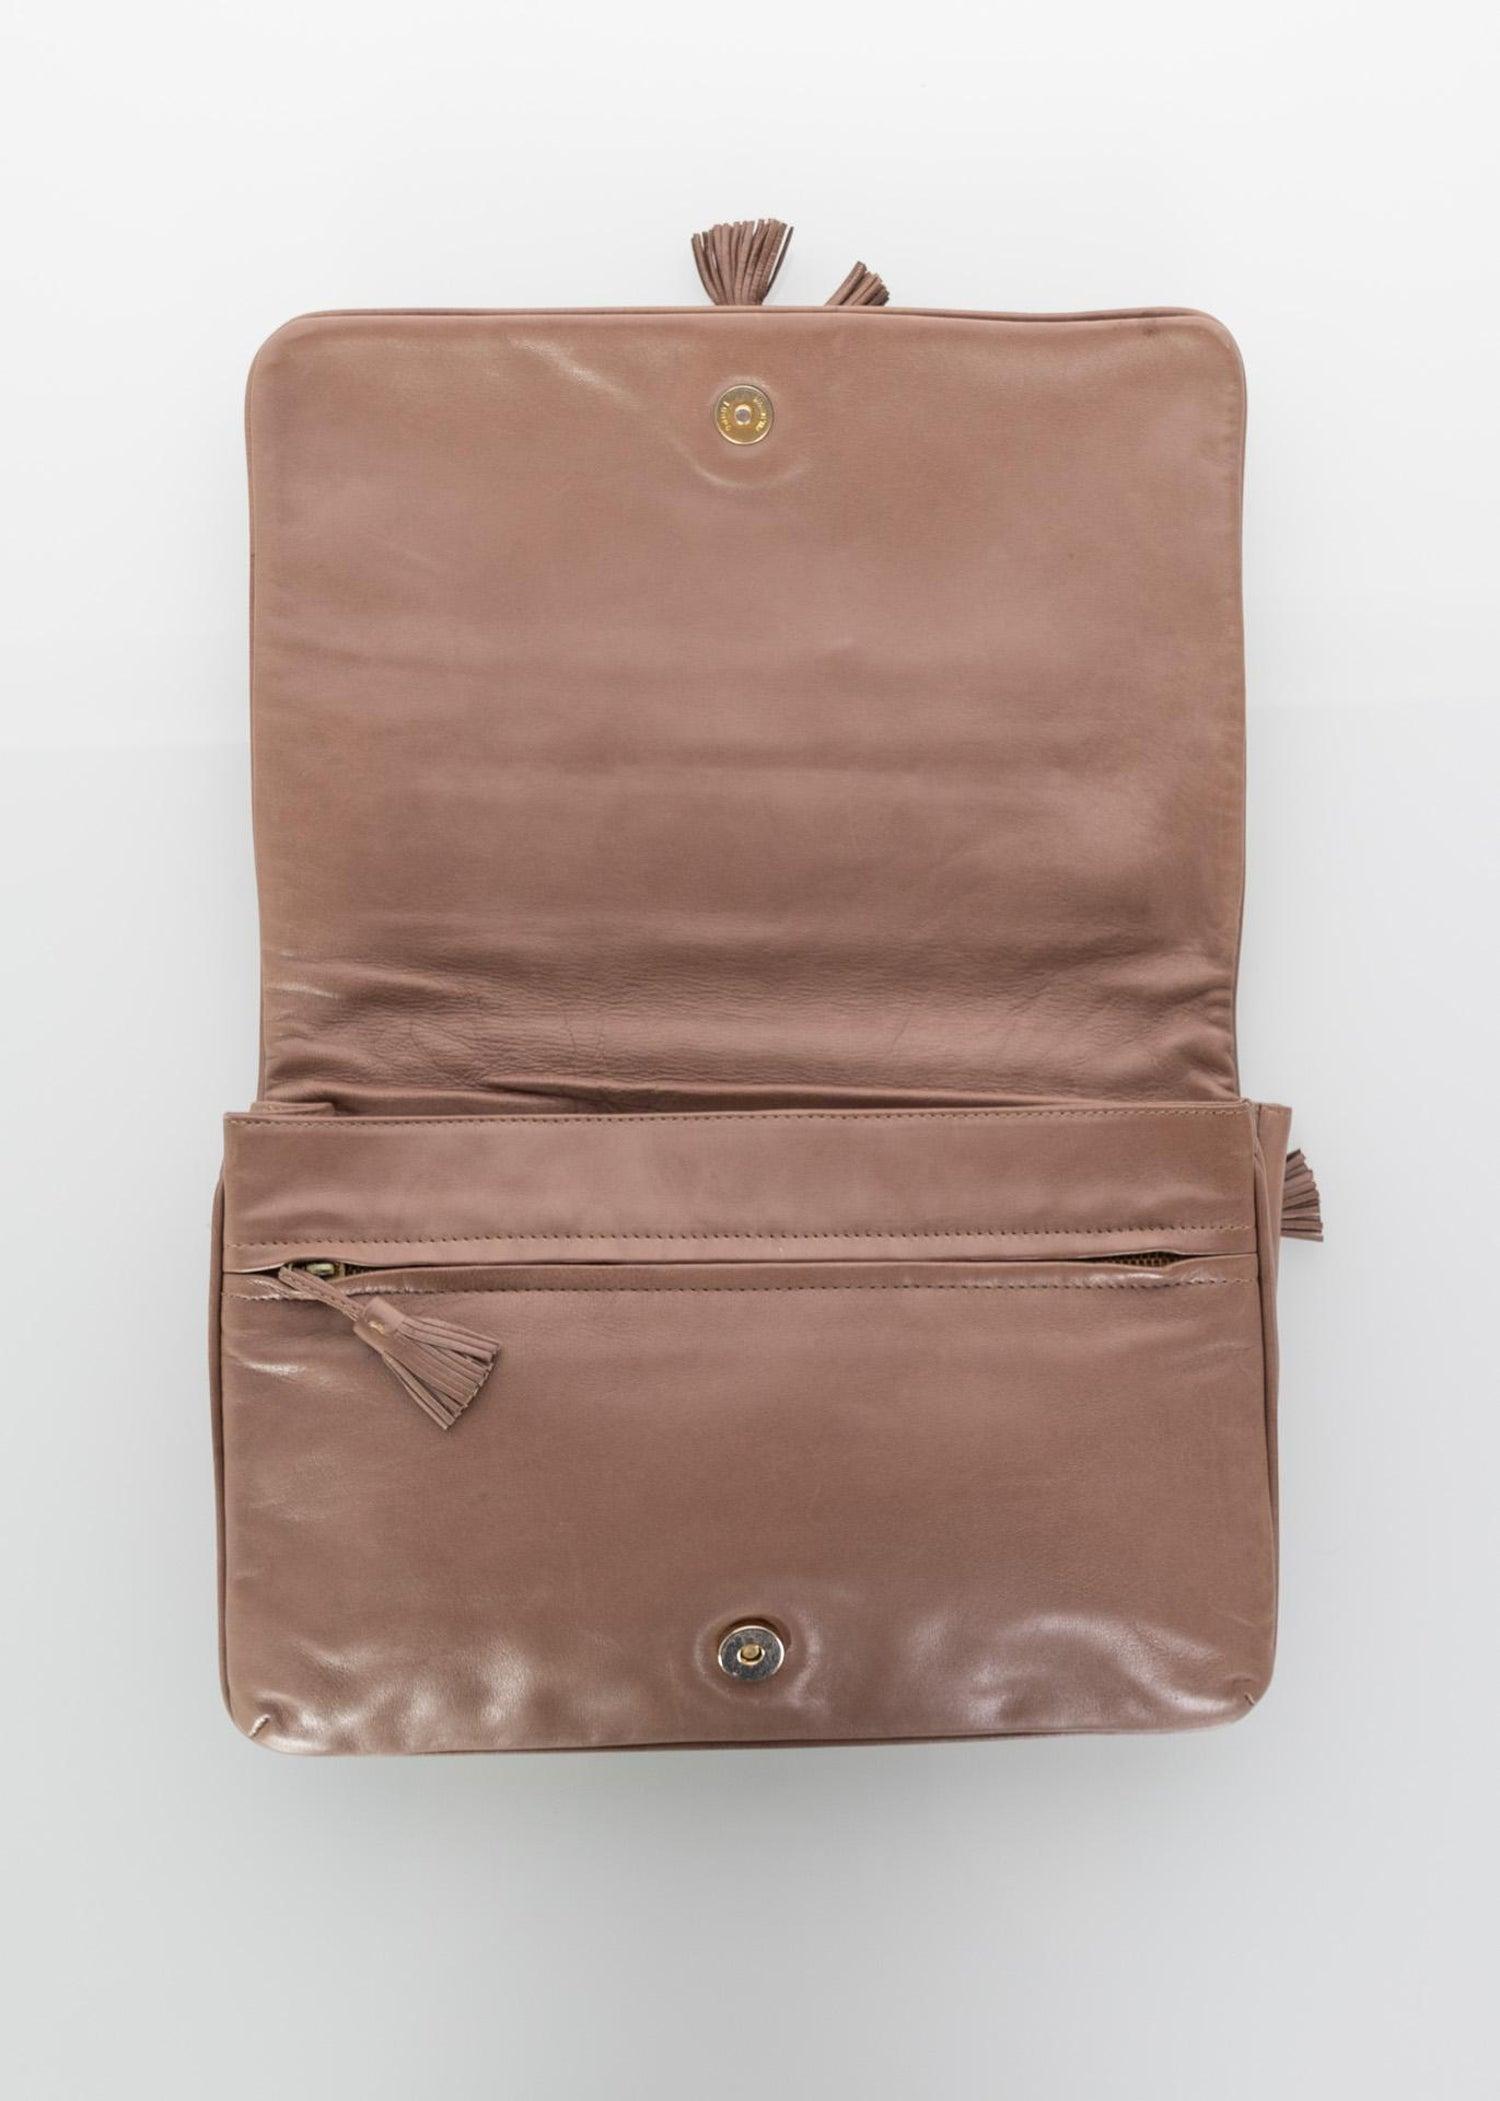 01761b9a64a8 Vintage Bottega Veneta Intrecciato Leather Tassel Clutch Bag For Sale at  1stdibs